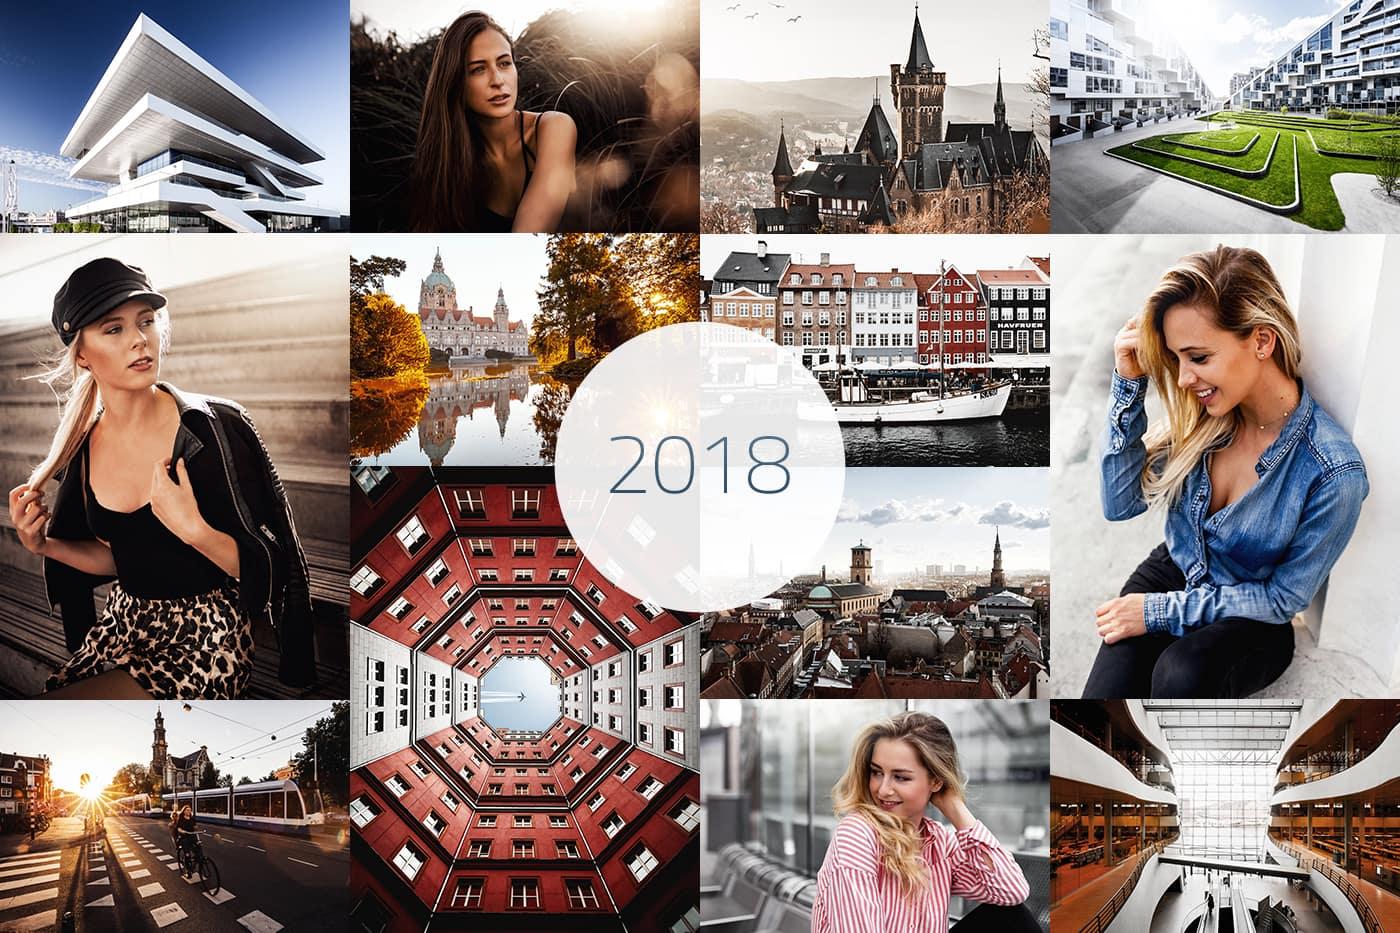 Fotograf aus Hannover Sebastian Grote – Best Of 2018